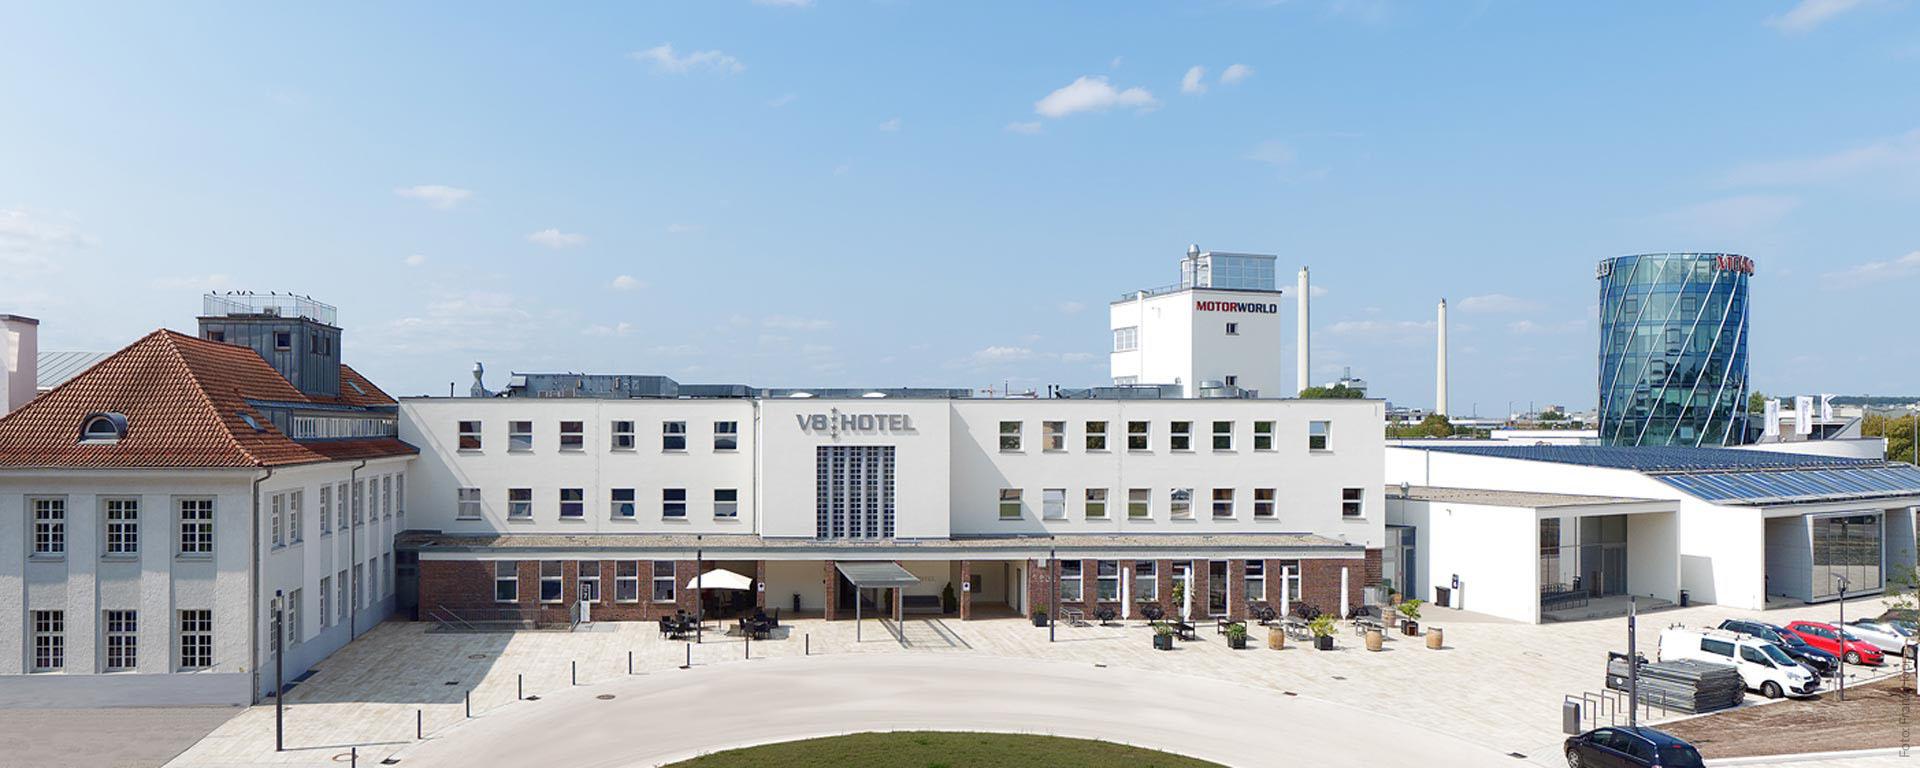 V8 HOTEL & V8 HOTEL CLASSIC: Das Automobile vier Sterne Superior Themenhotel / Designhotel in Böblingen (BB) Flugfeld, MOTORWORLD REGION STUTTGART